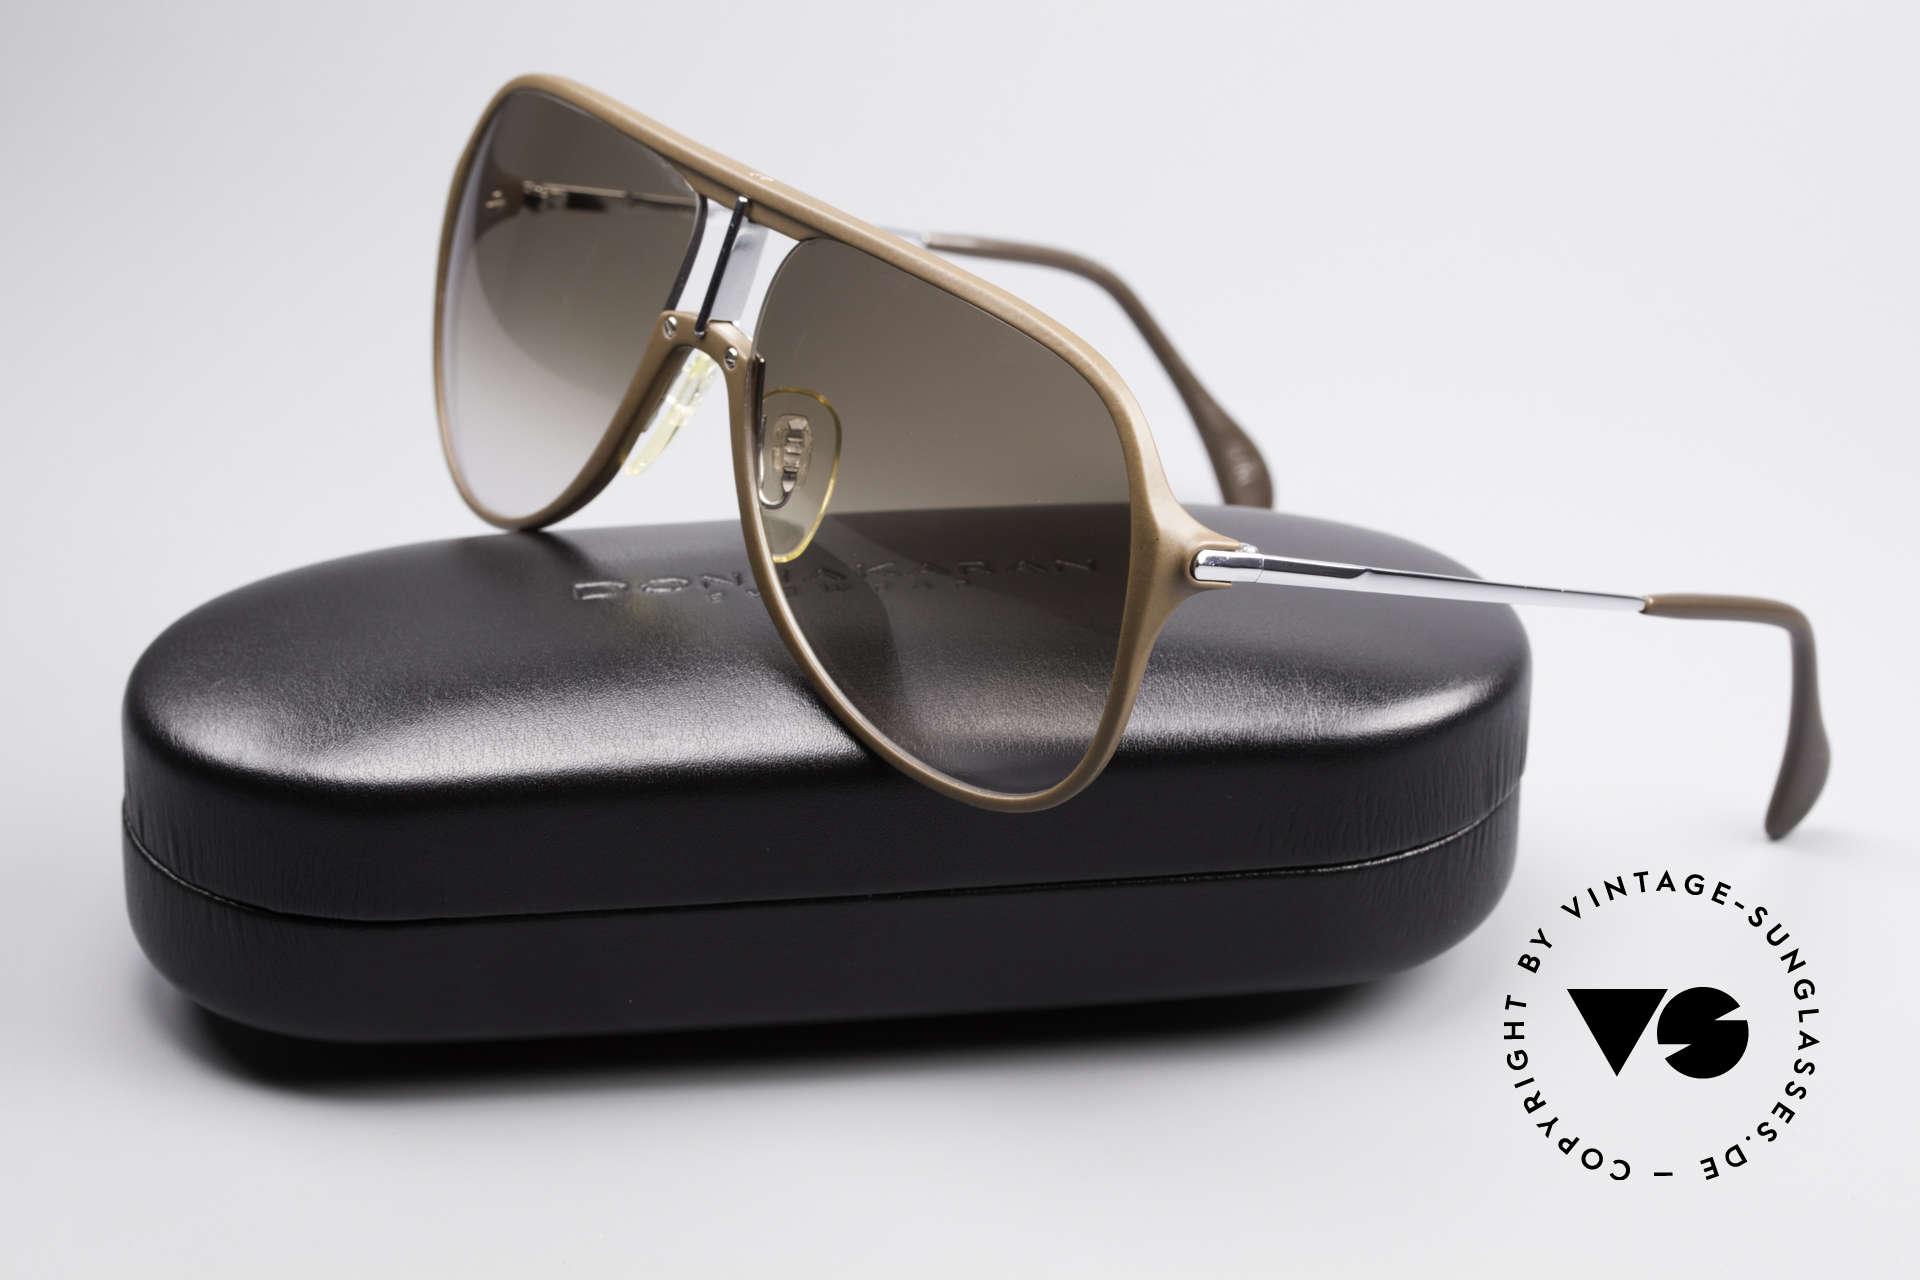 Menrad 727 80's Quality Sunglasses Men, Size: large, Made for Men